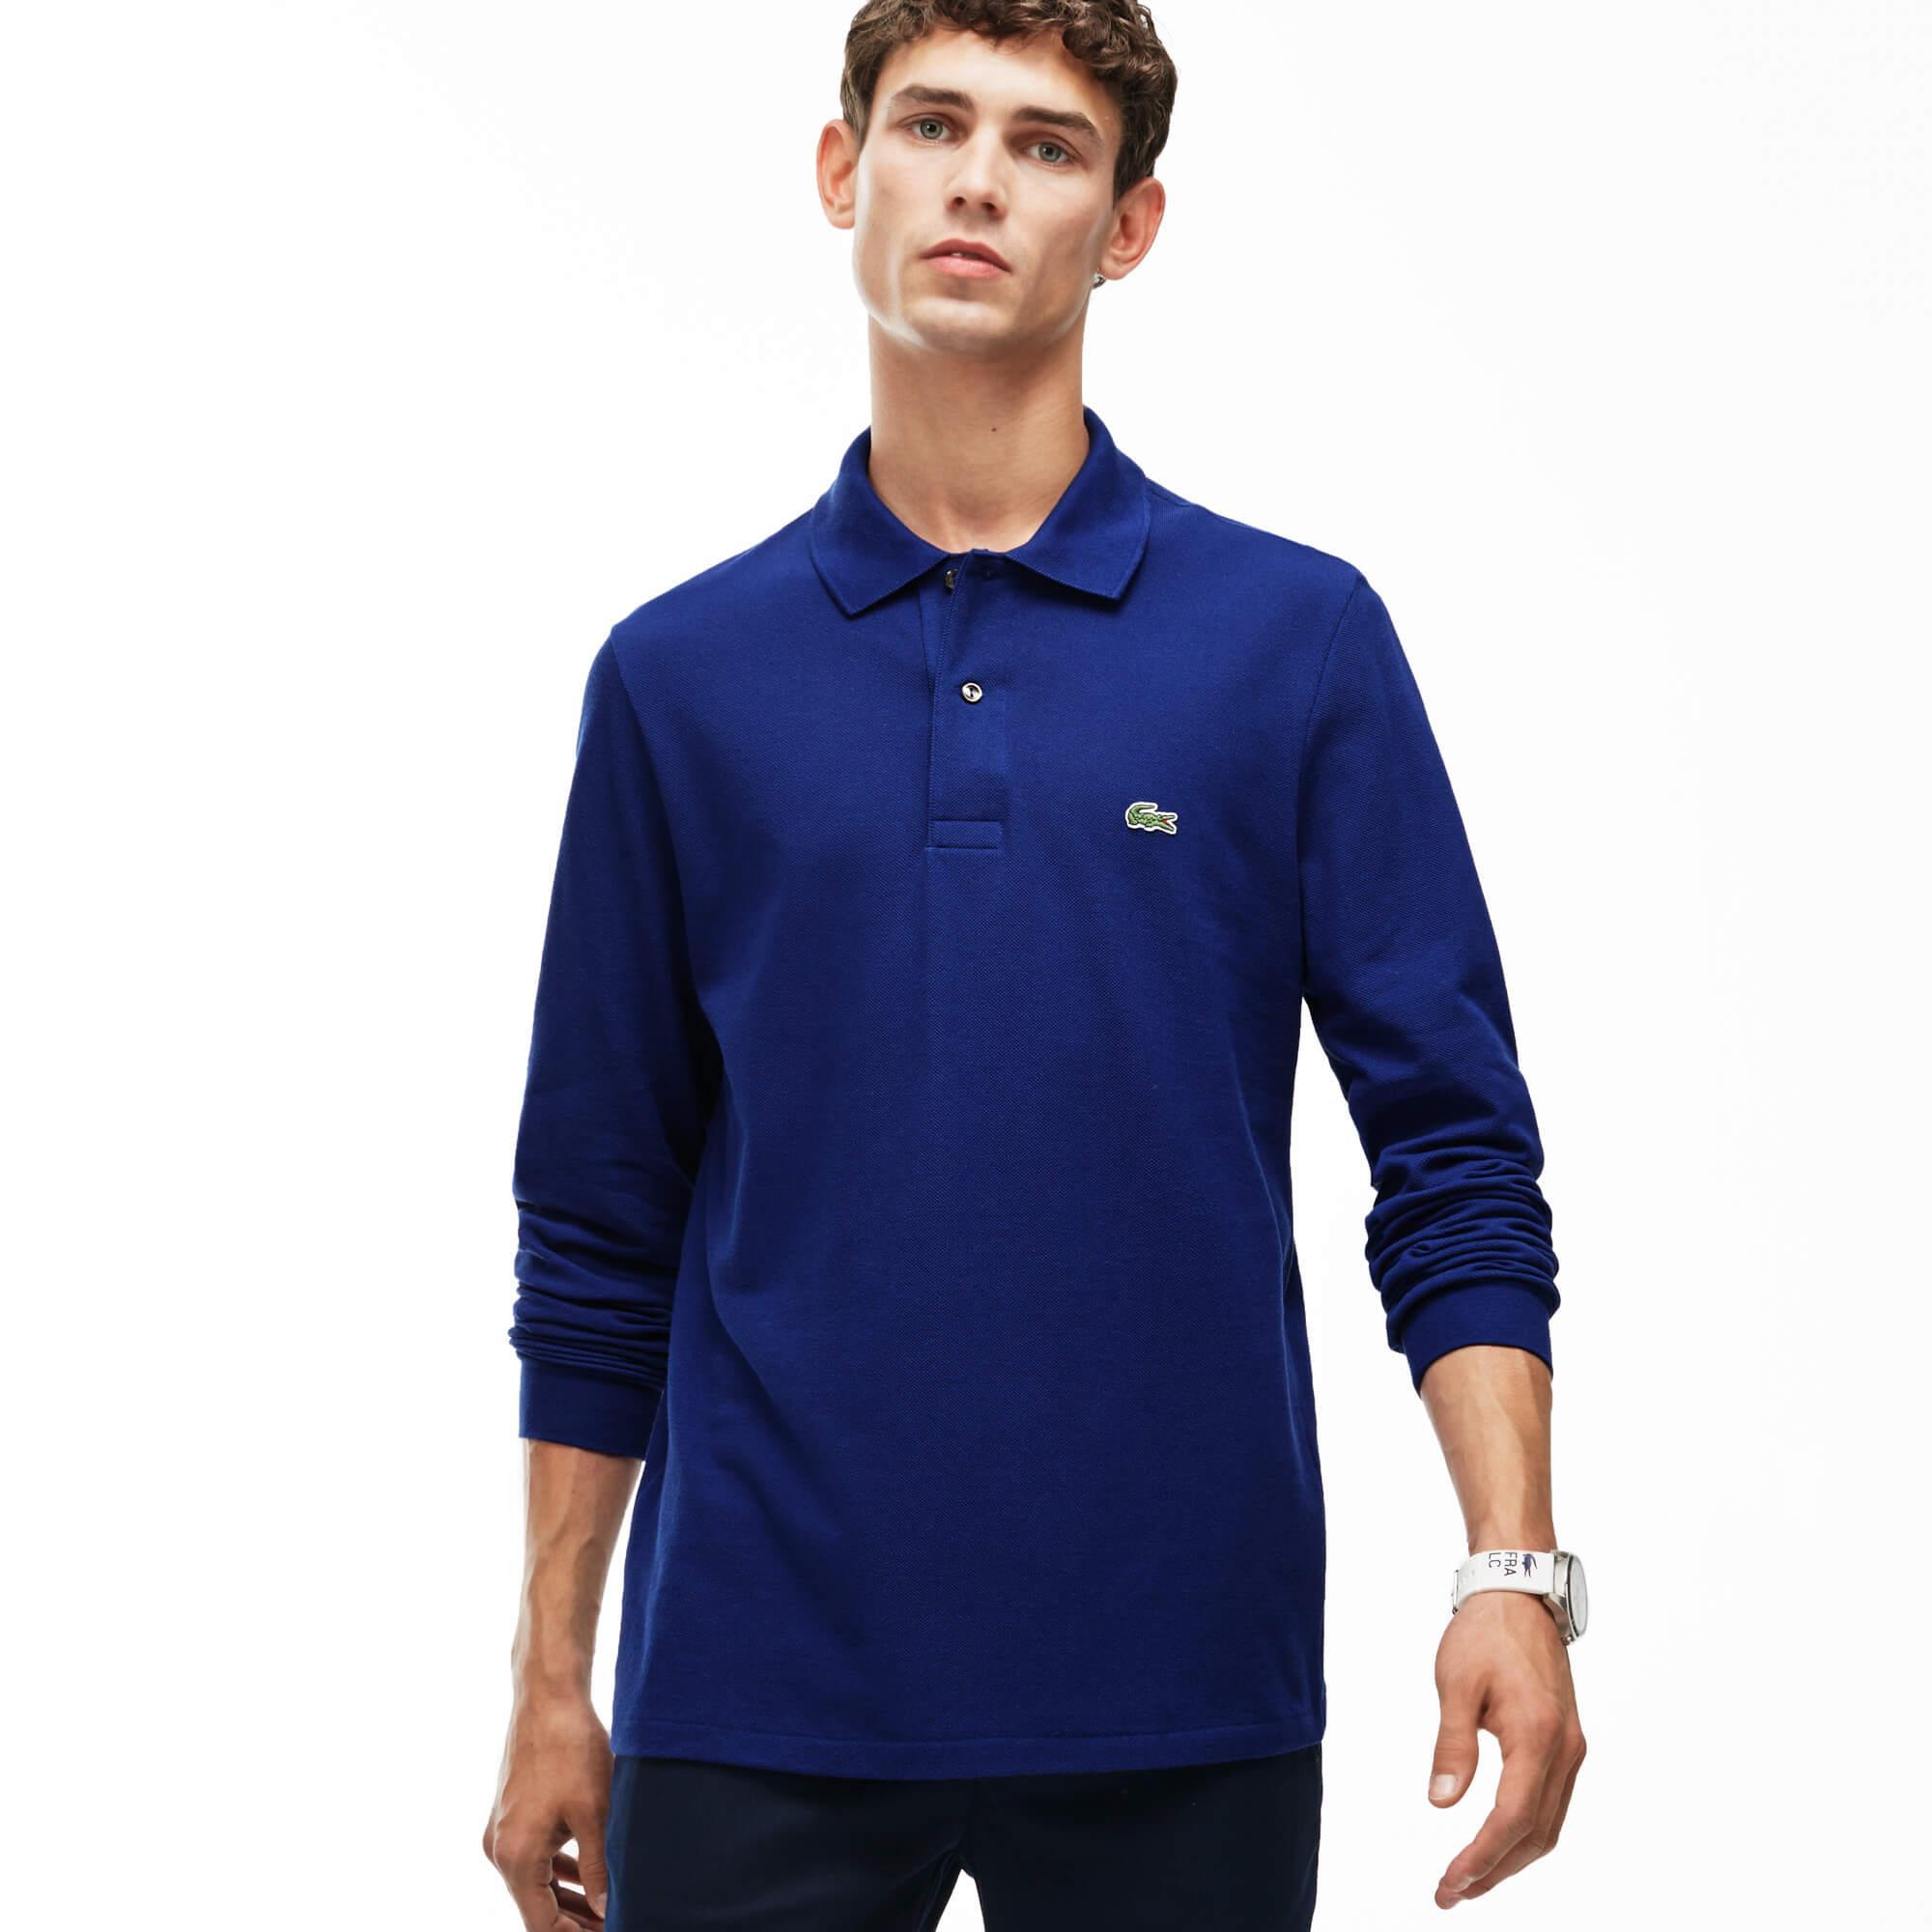 Lacoste Erkek Klasik Fit L1212 Uzun Kollu Mavi Polo